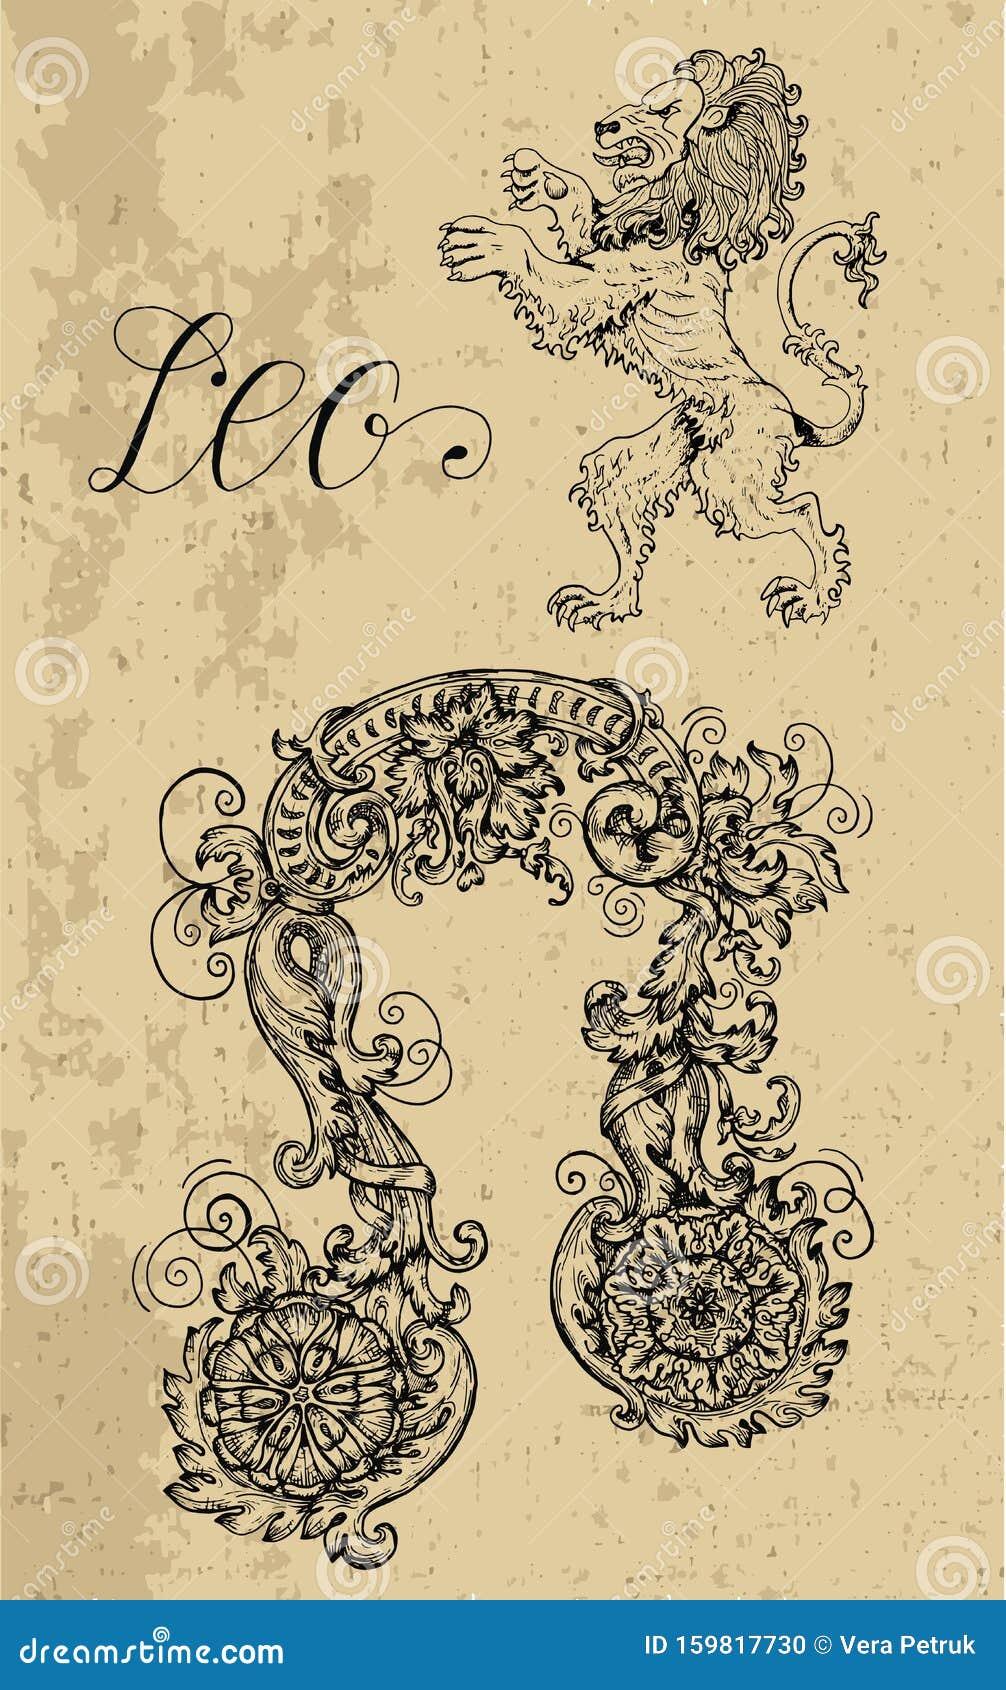 Esoteric astrology pdf